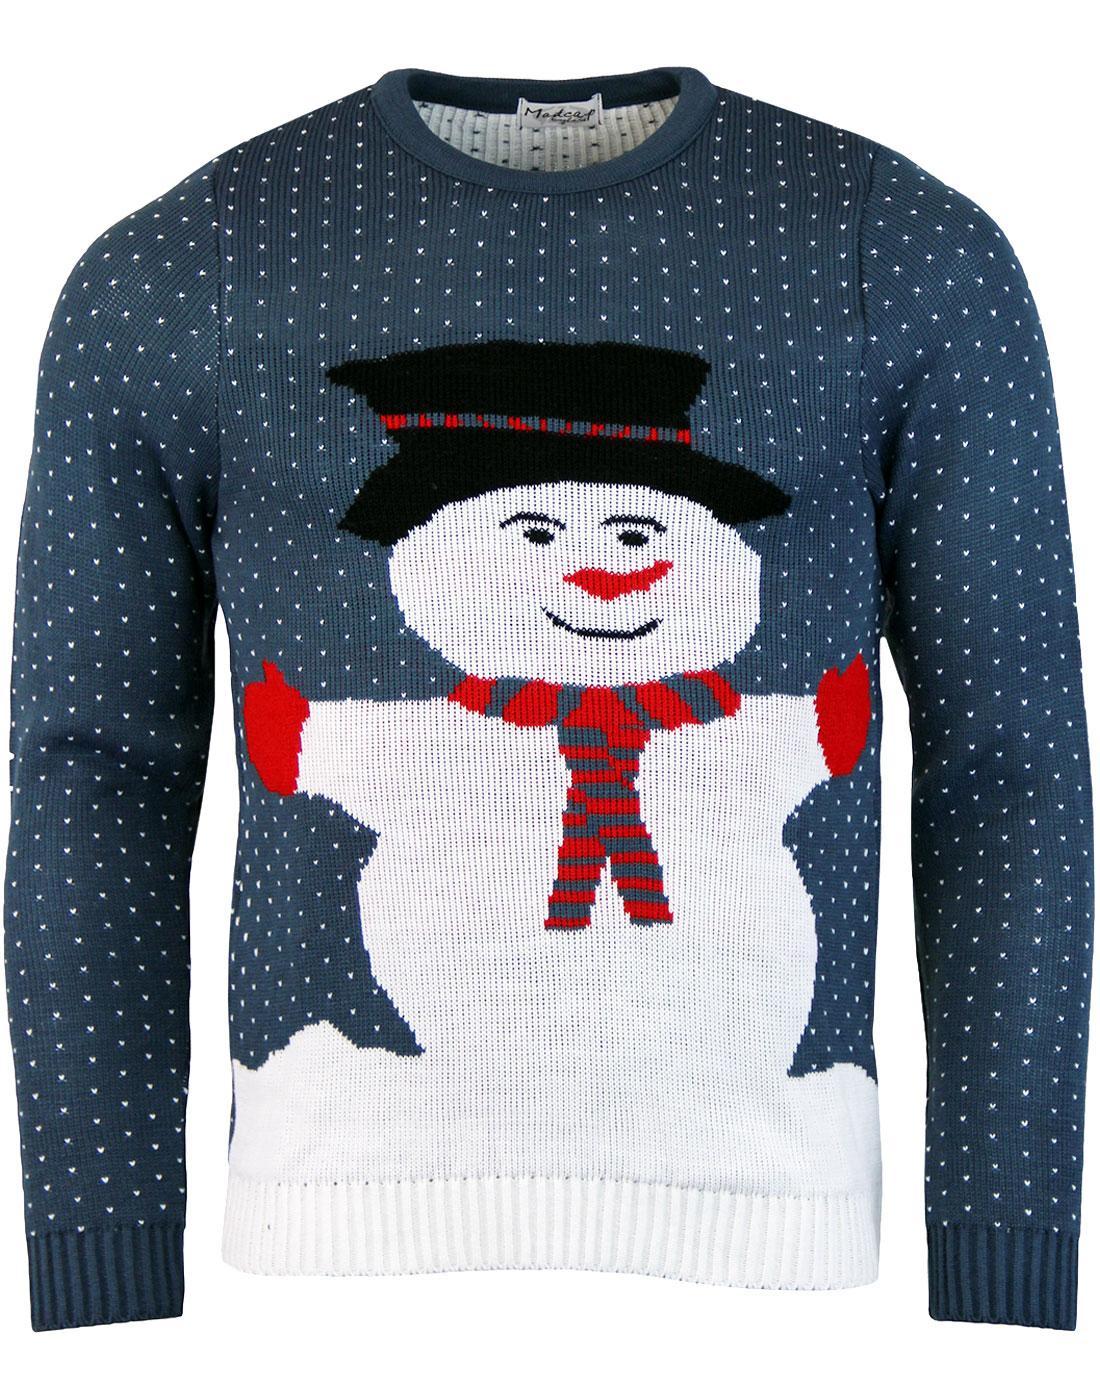 Mr Snowy - Retro 70s Snowman Christmas Jumper